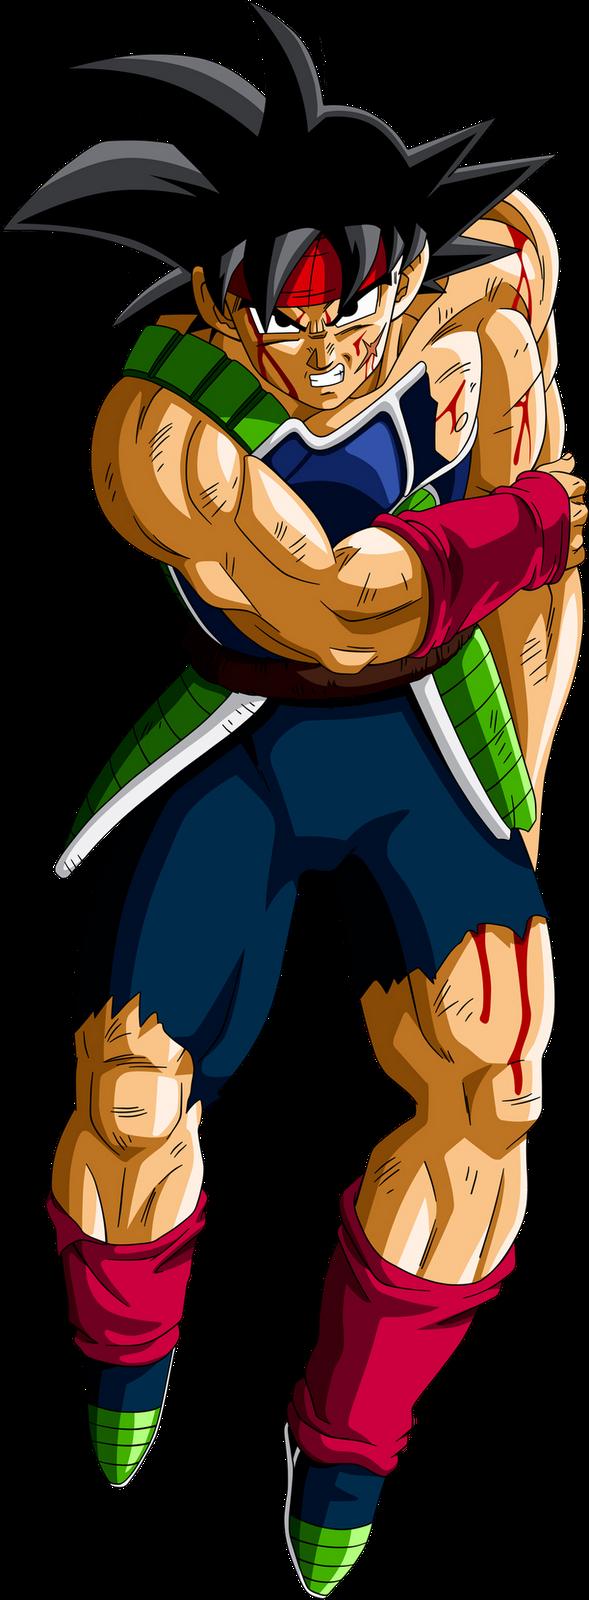 Dbz Bardock Ssj Dios Dbz Goku Son Bardock Ssj